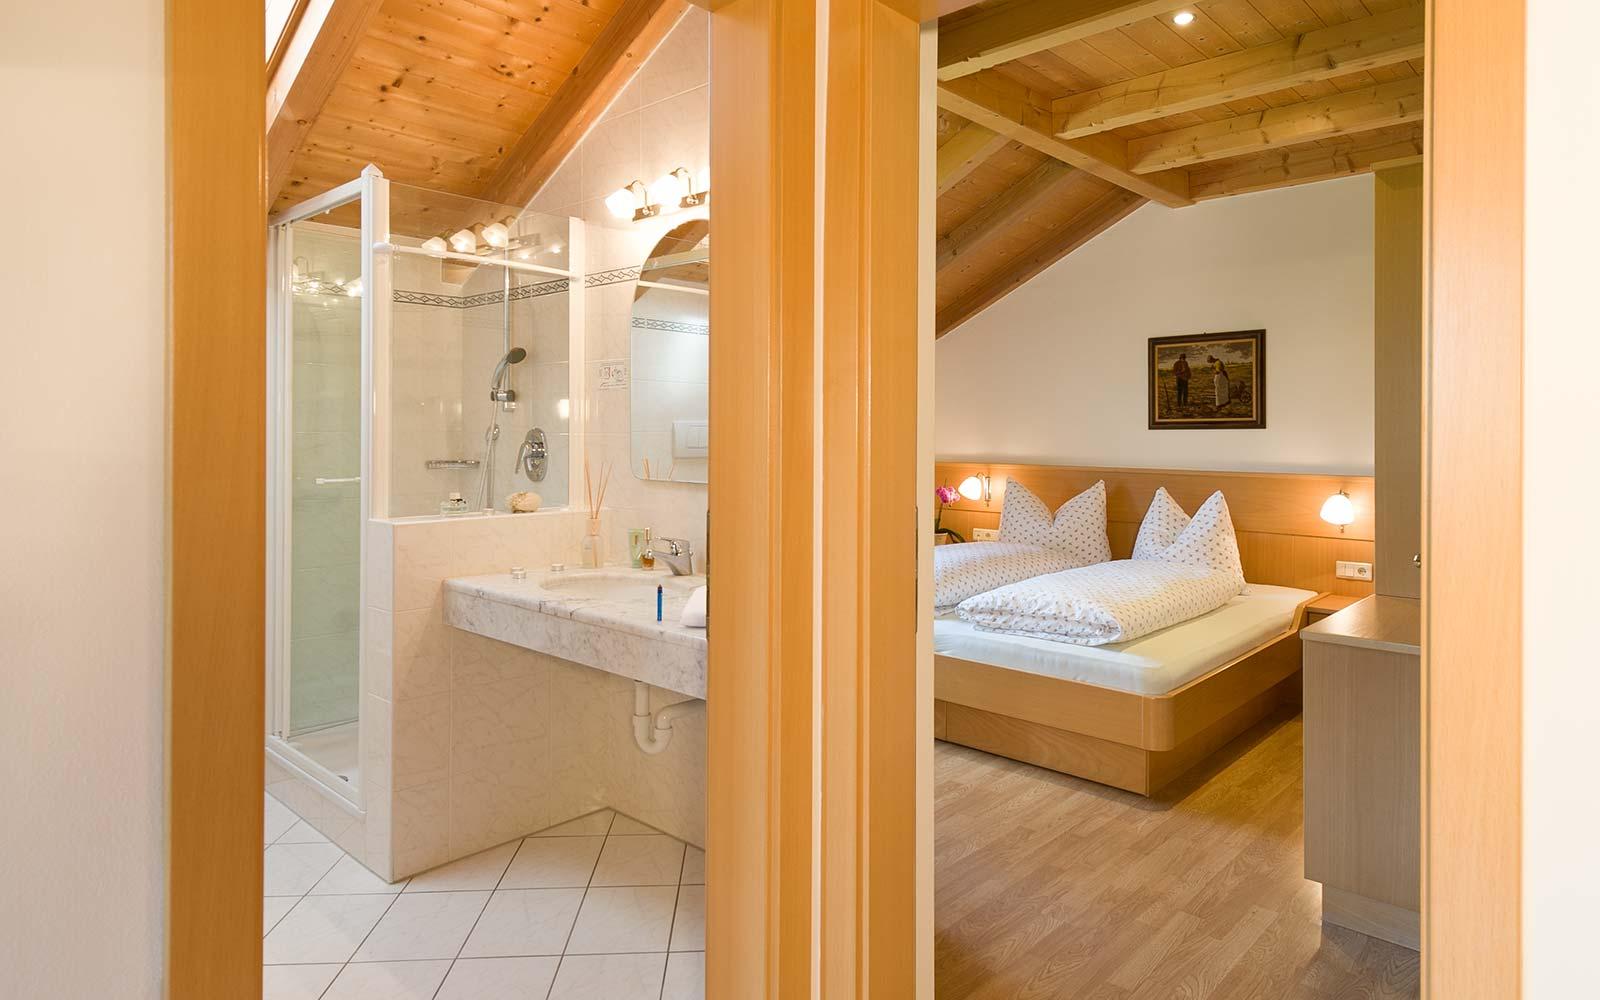 Appartamenti vacanze Merano: splendido sole al Hecherhof